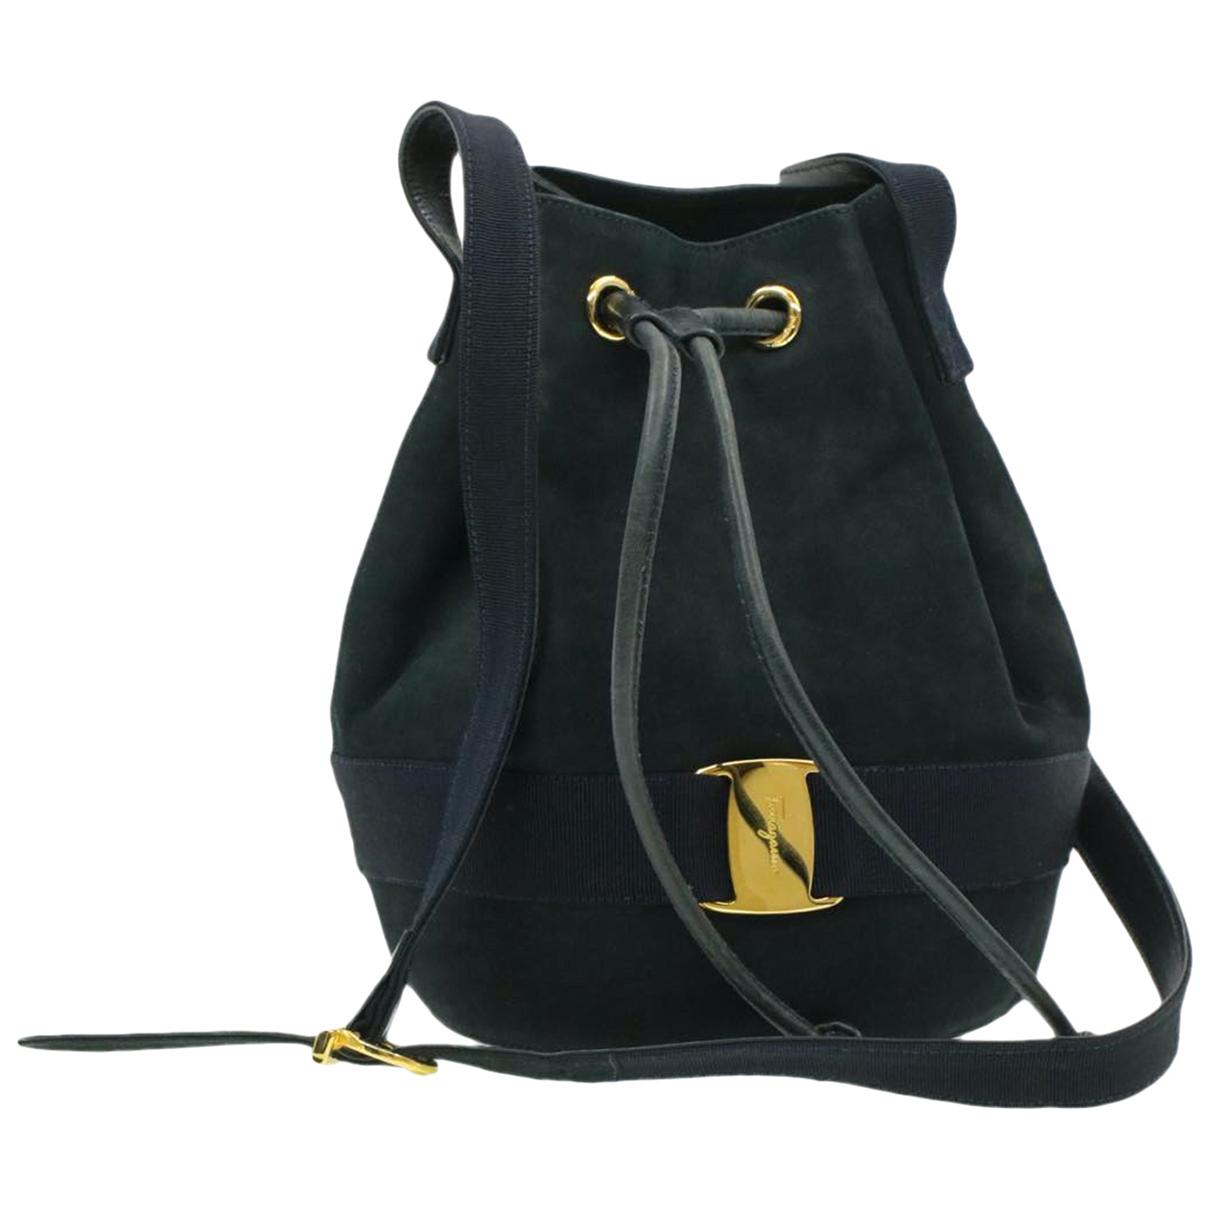 Salvatore Ferragamo \N Navy Suede handbag for Women \N